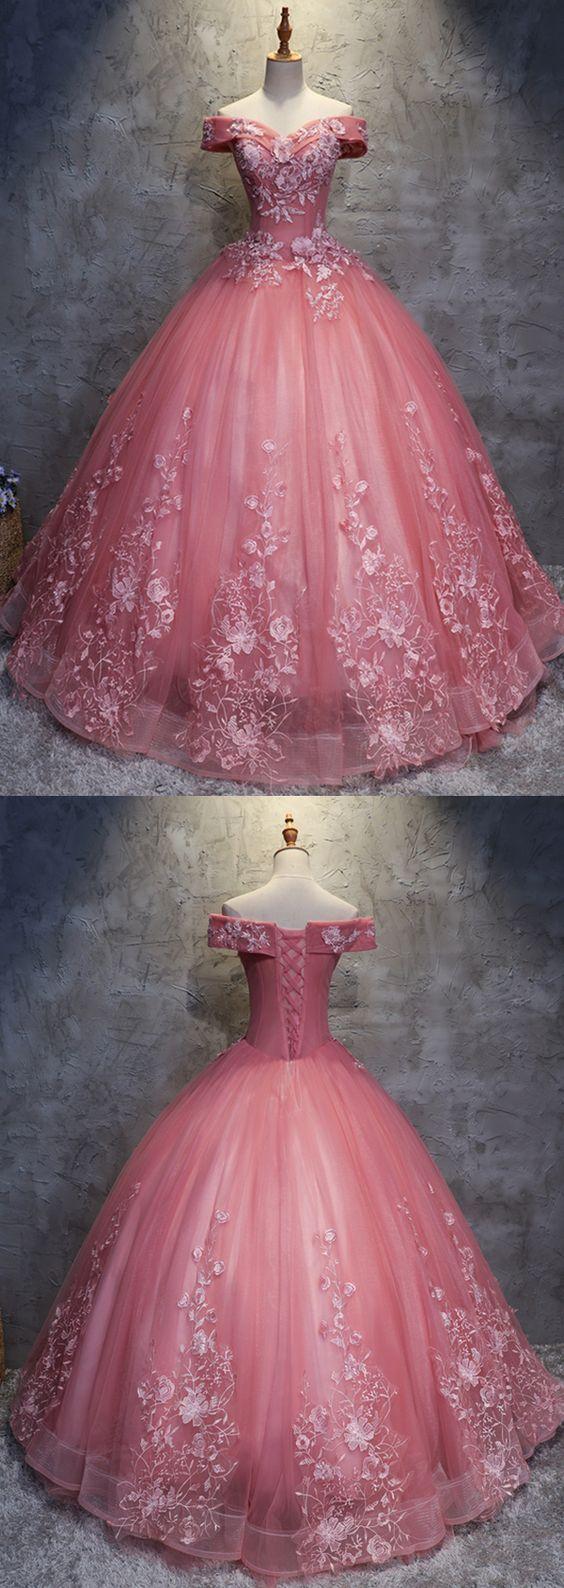 46 best Cinderella\'s Royal Ball images on Pinterest | Xv dresses ...